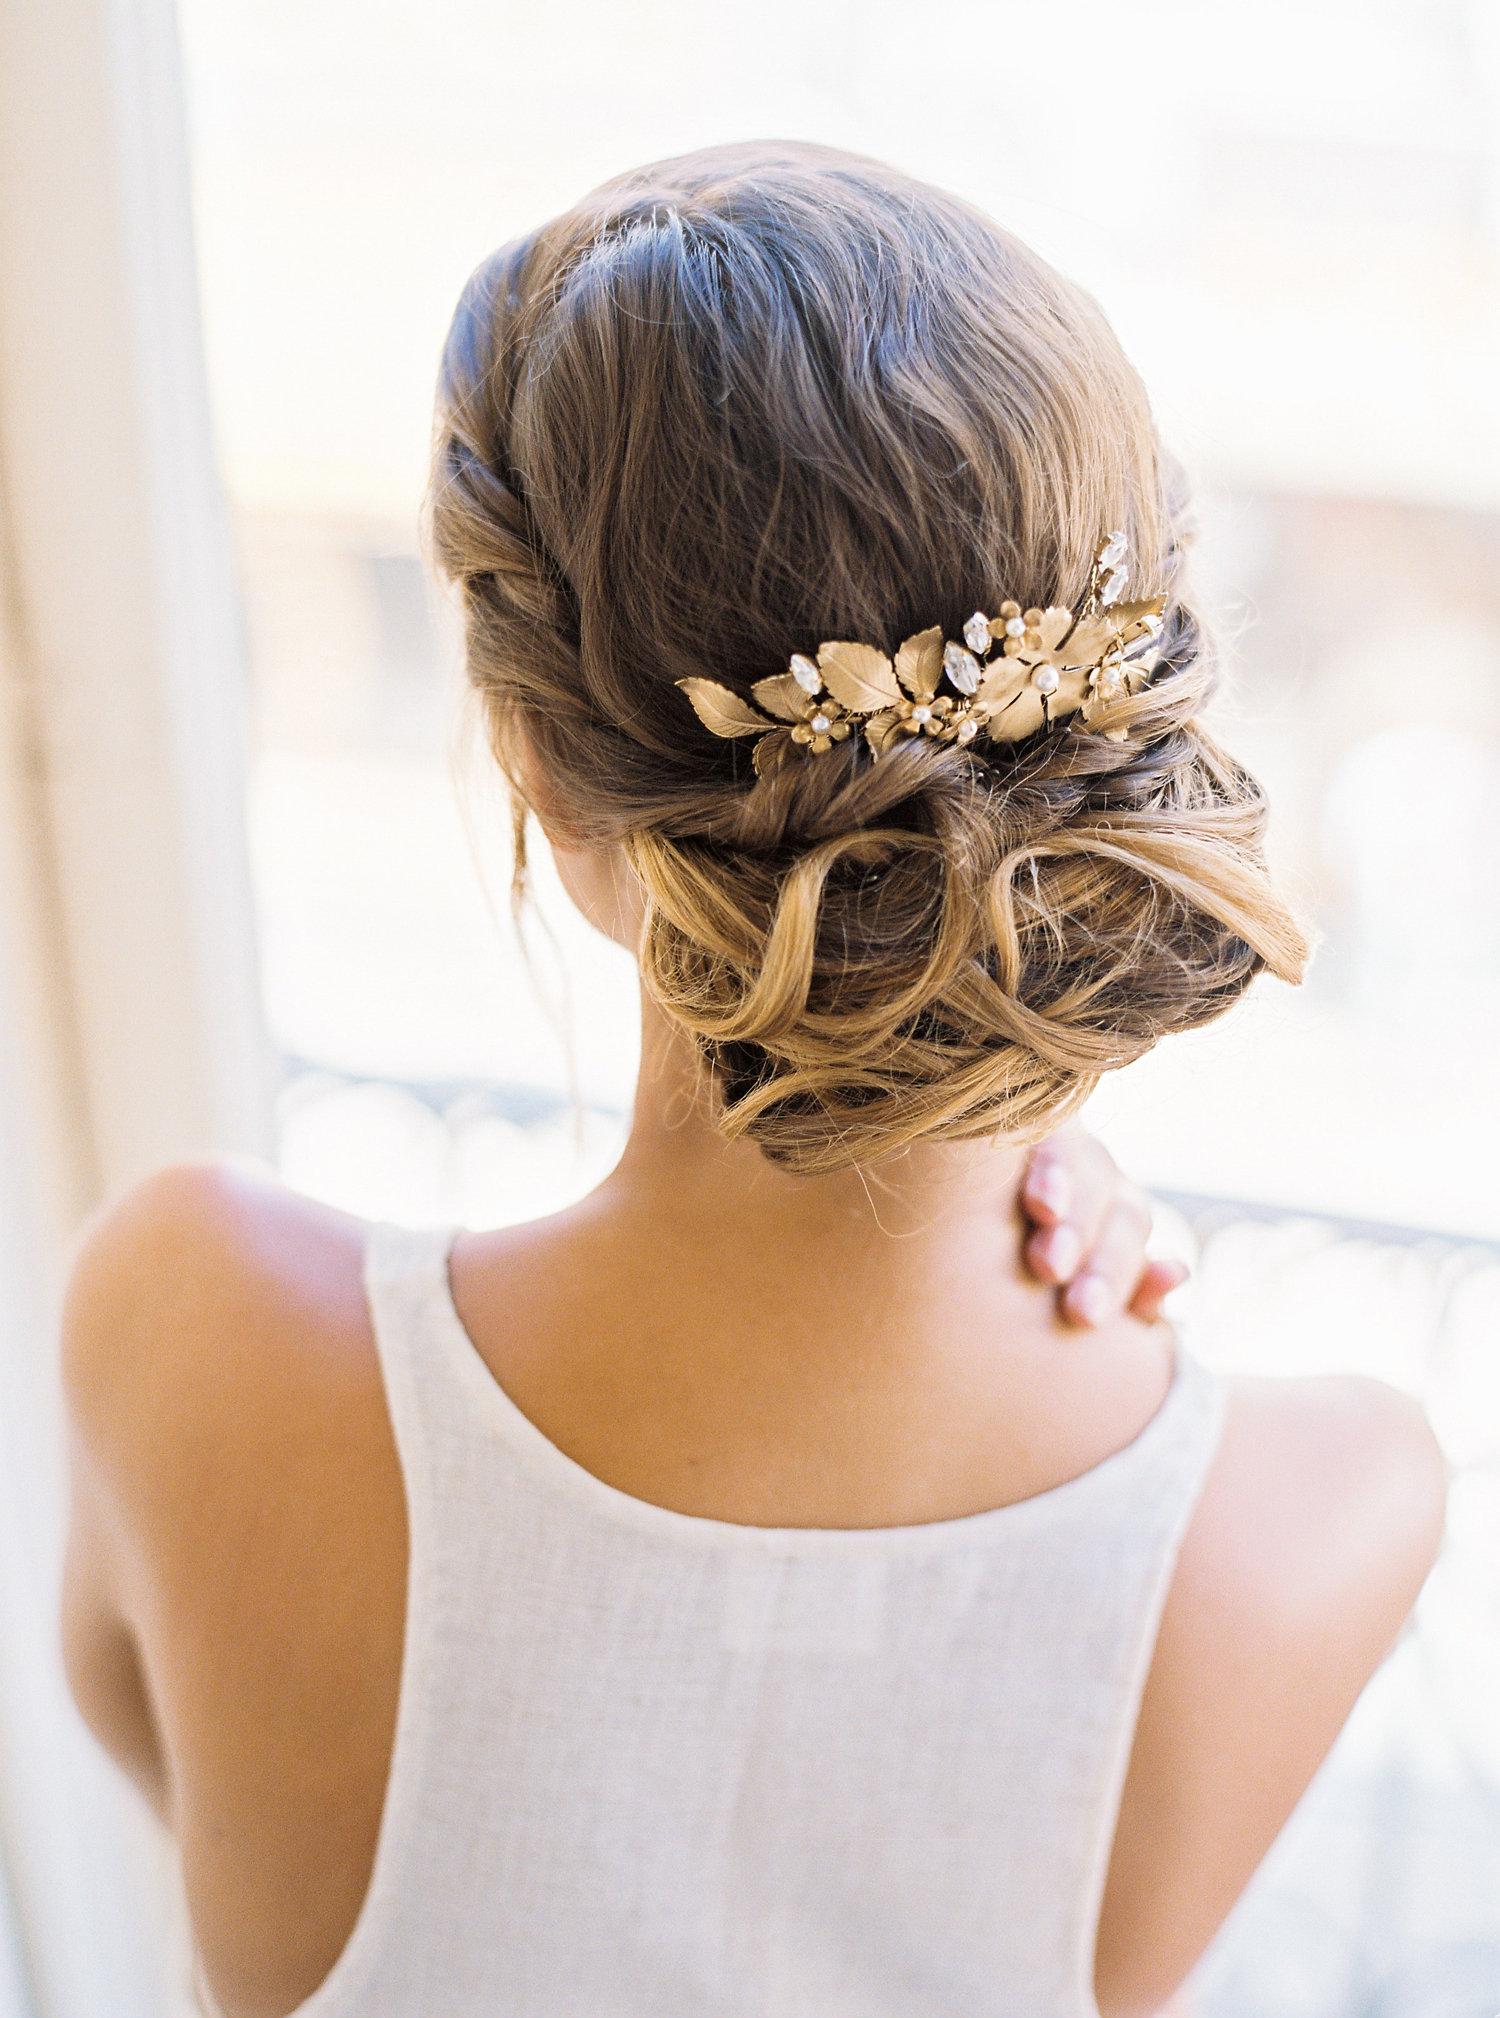 chignon mariage flou affinite beauté - branco Prata